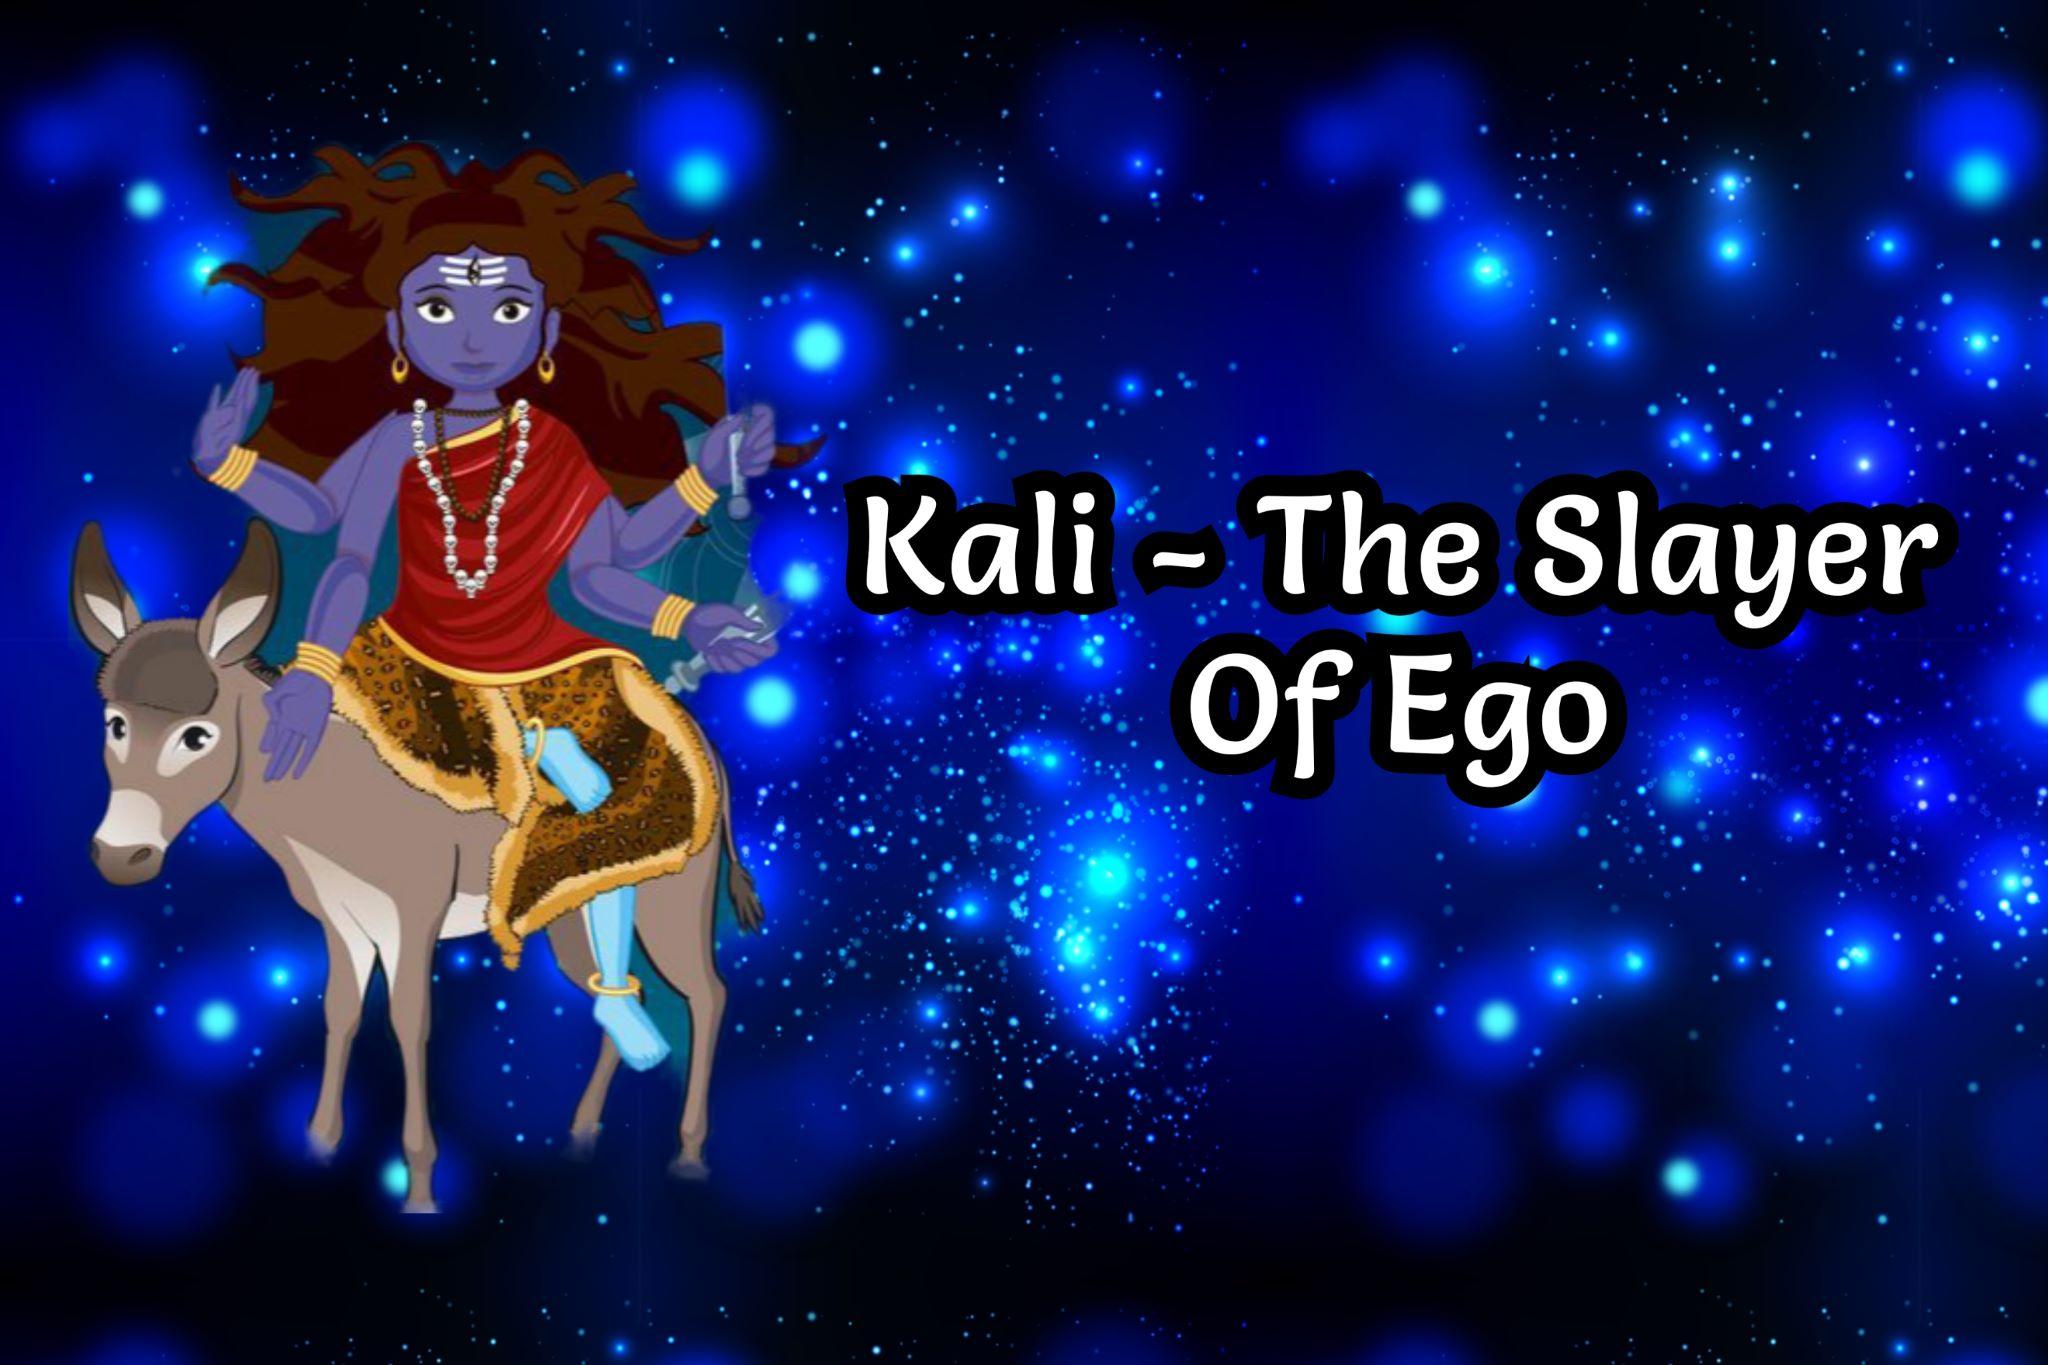 Kali- The Slayer Of Ego